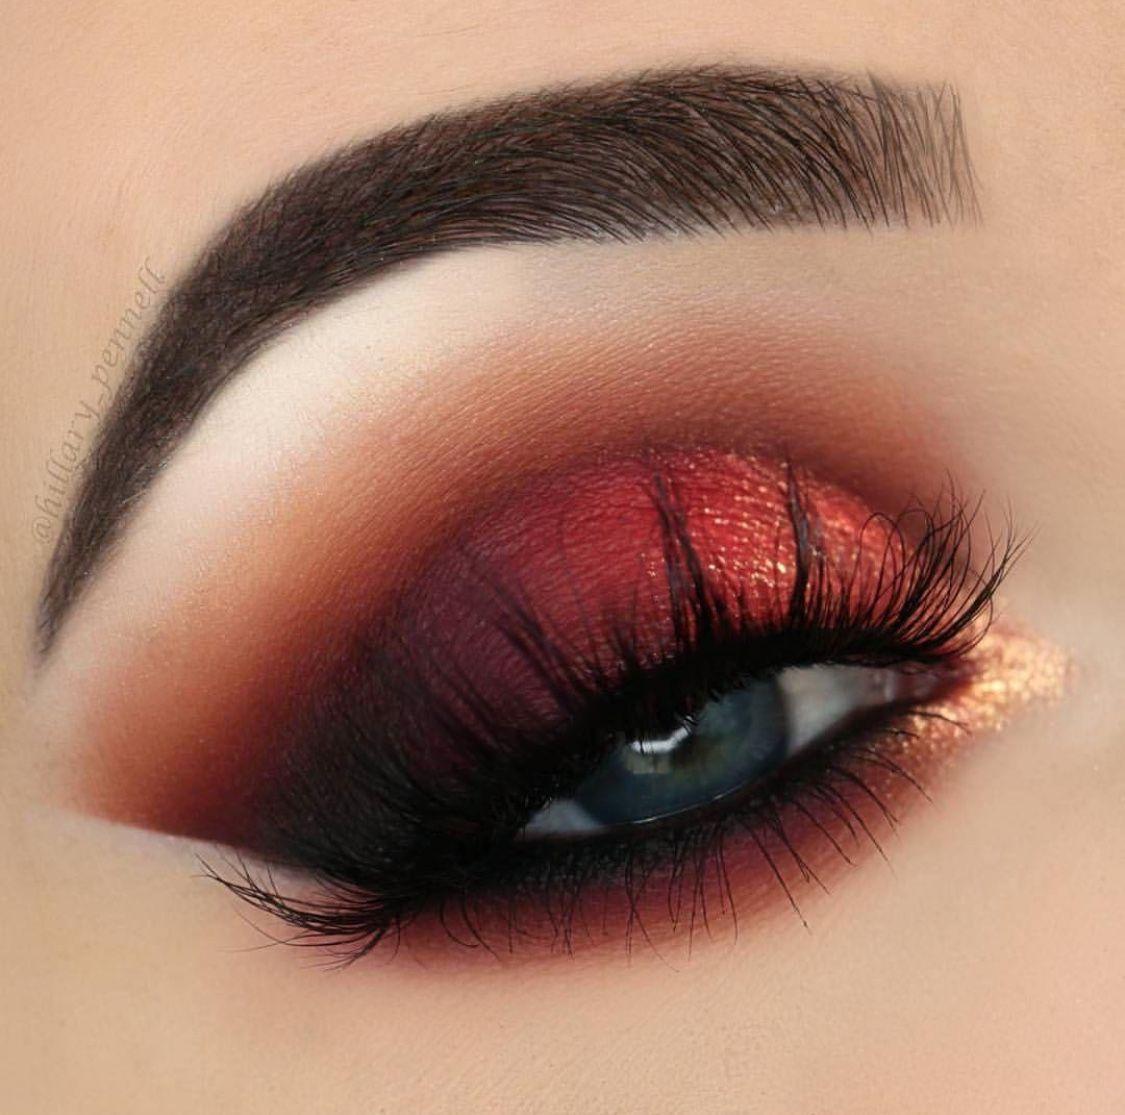 Kiss Out Of Makeup: PIN&IG: @LAURAAABIGAIL